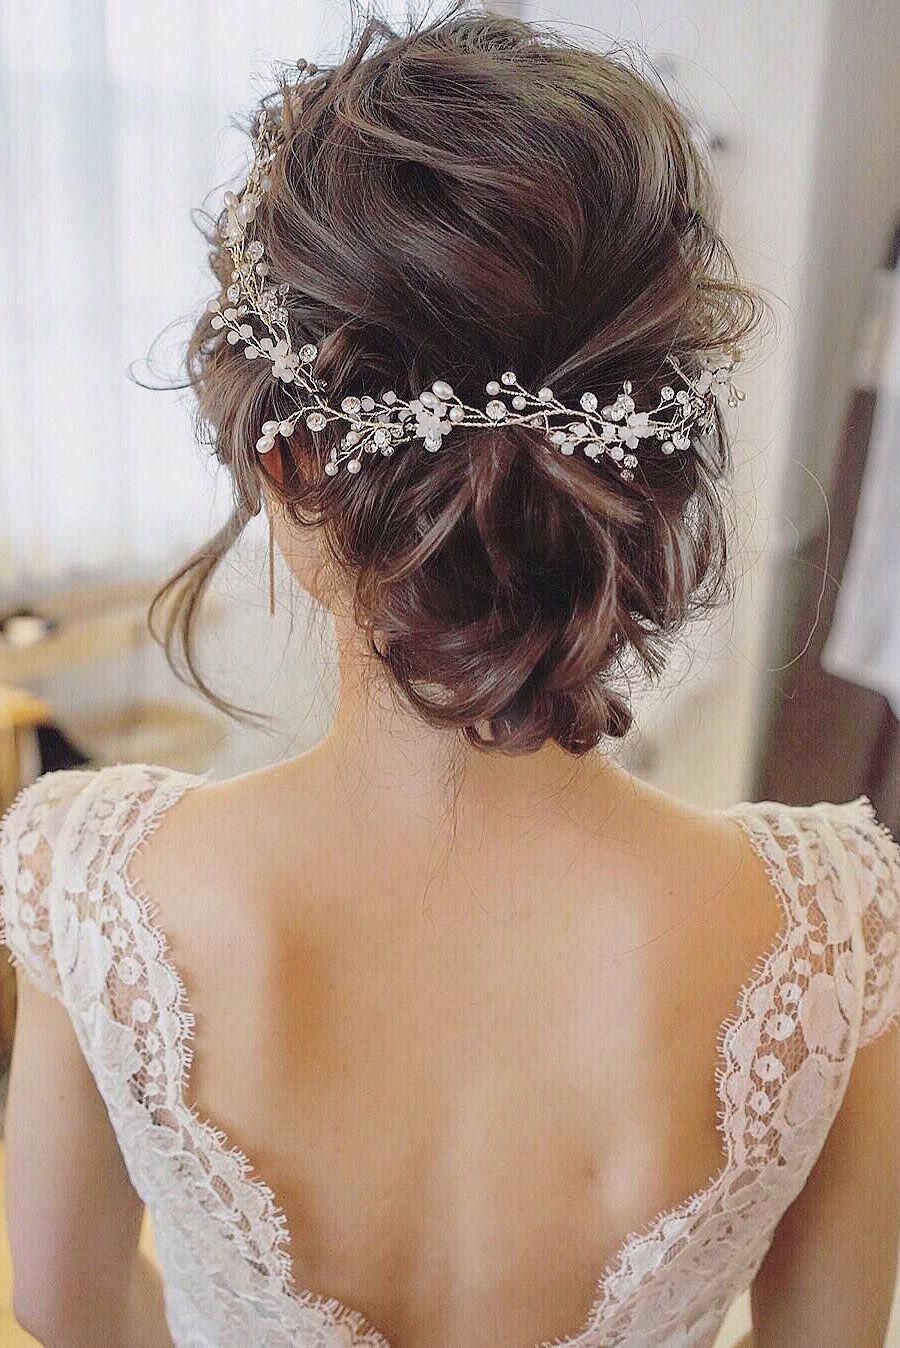 Sweet Updo Hairstyles for Shorter Hair Brides Wedding hair in